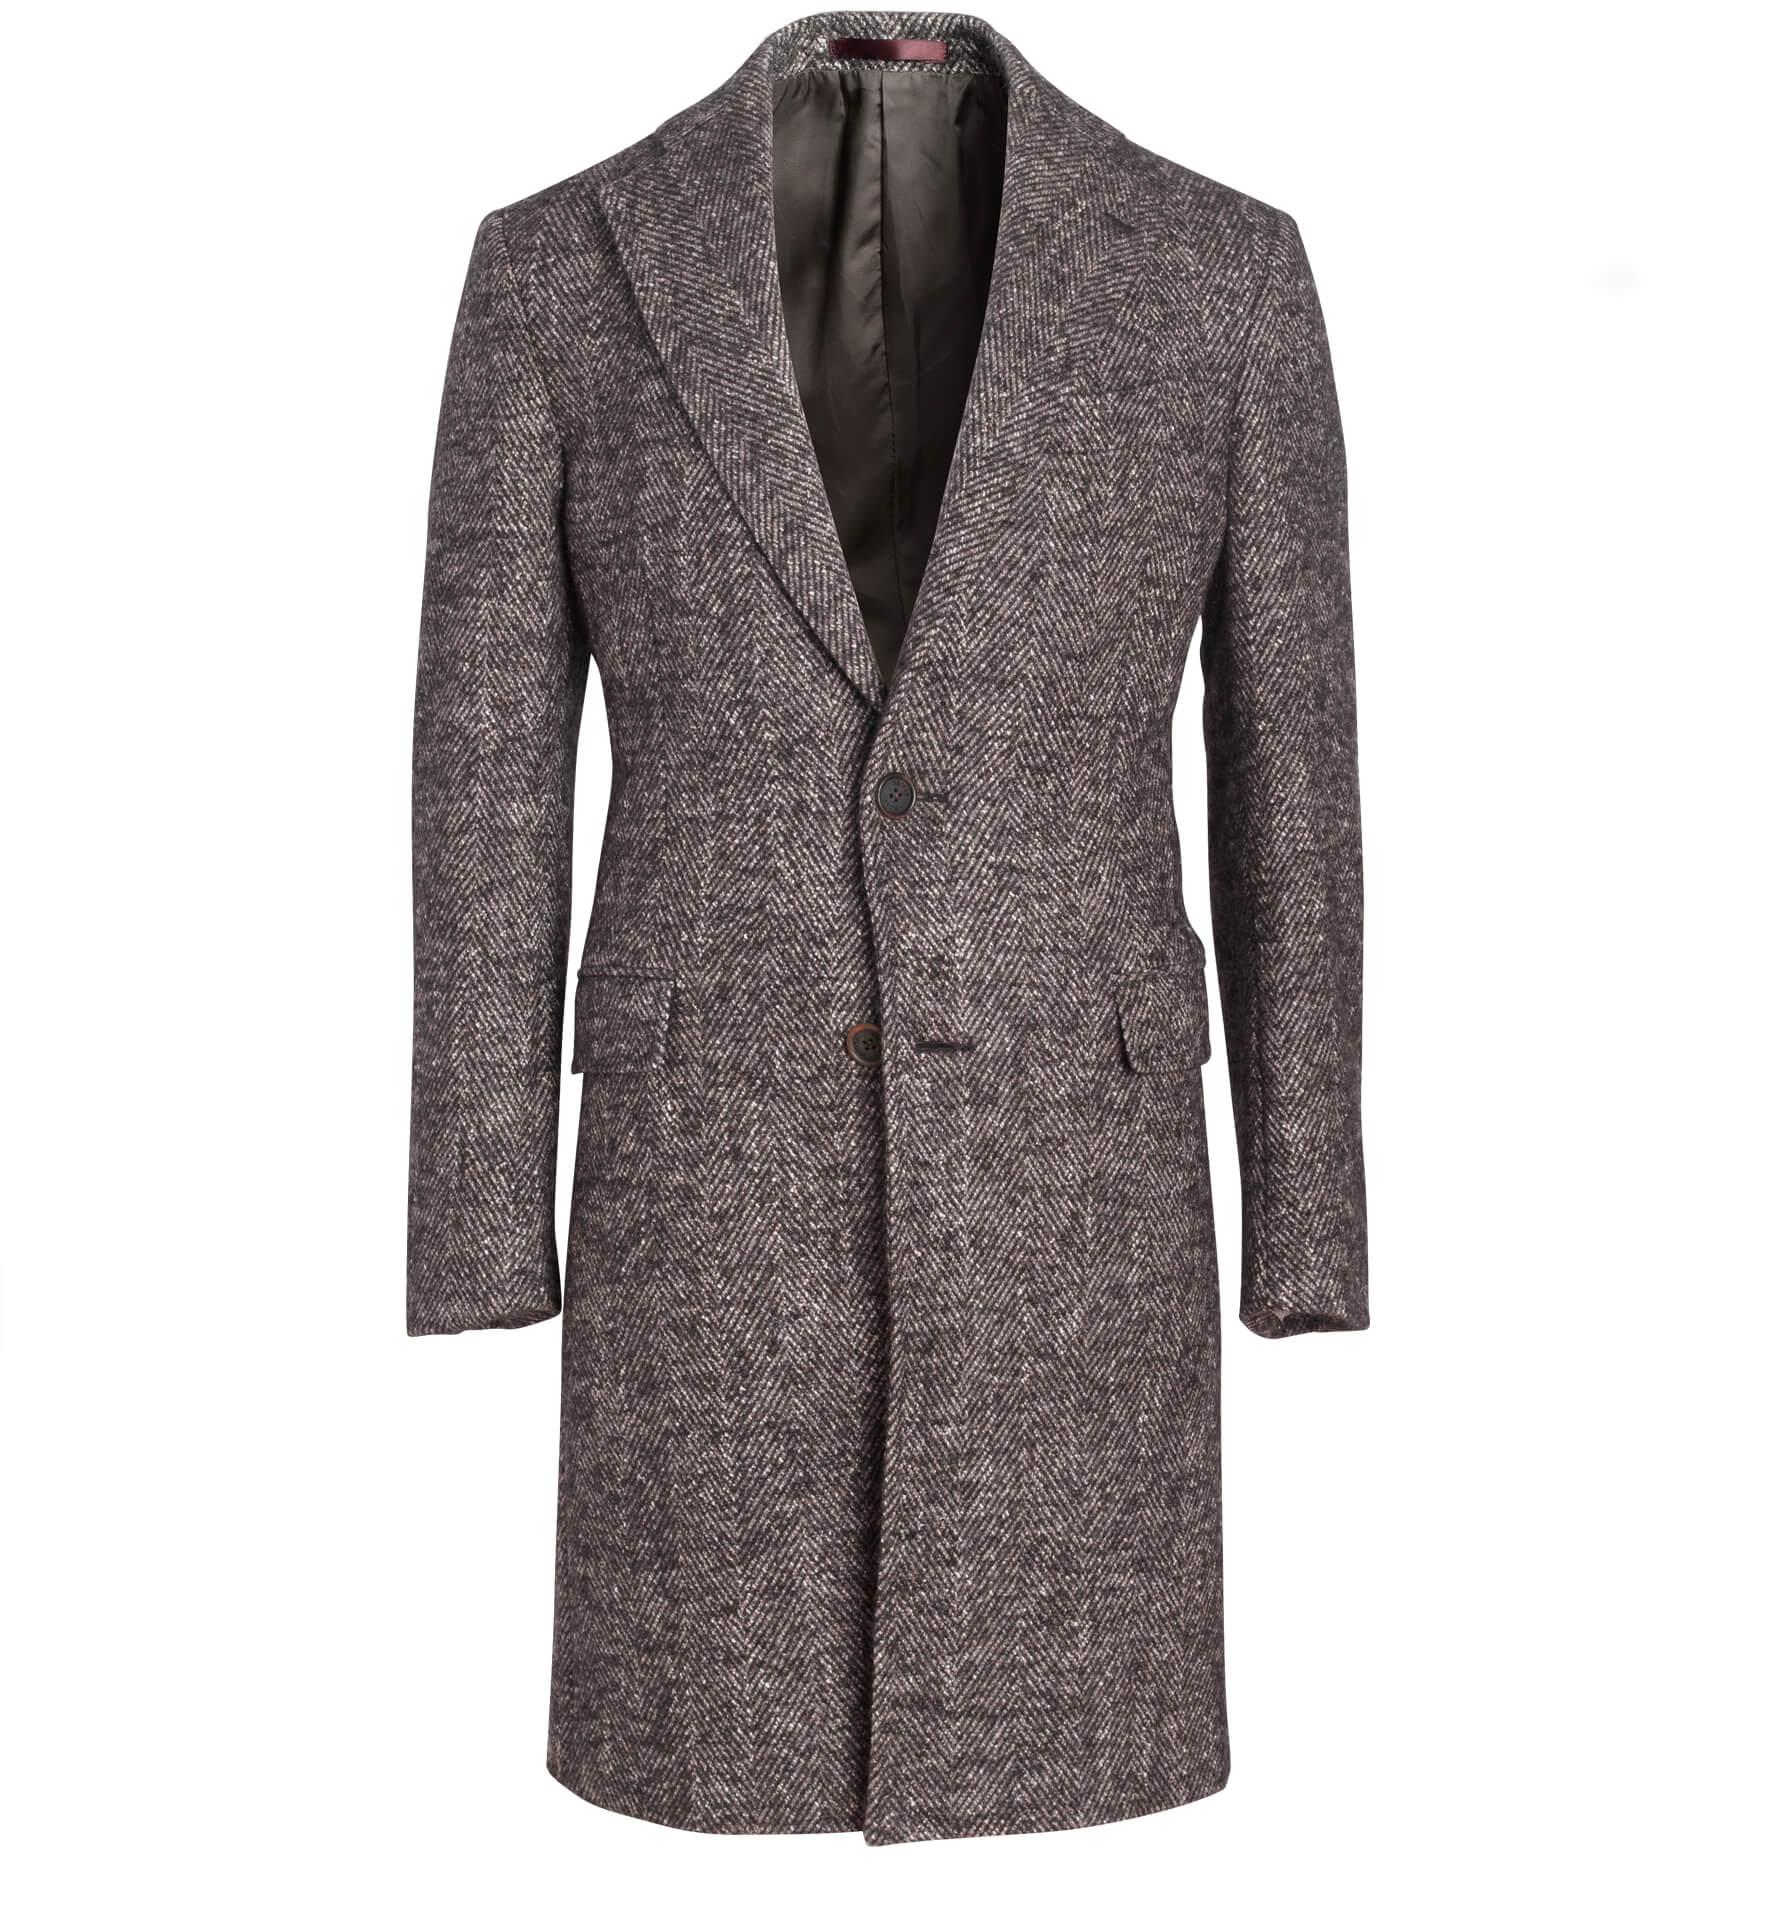 Zoom Image of Bleecker Brown Textured Wool Herringbone Coat